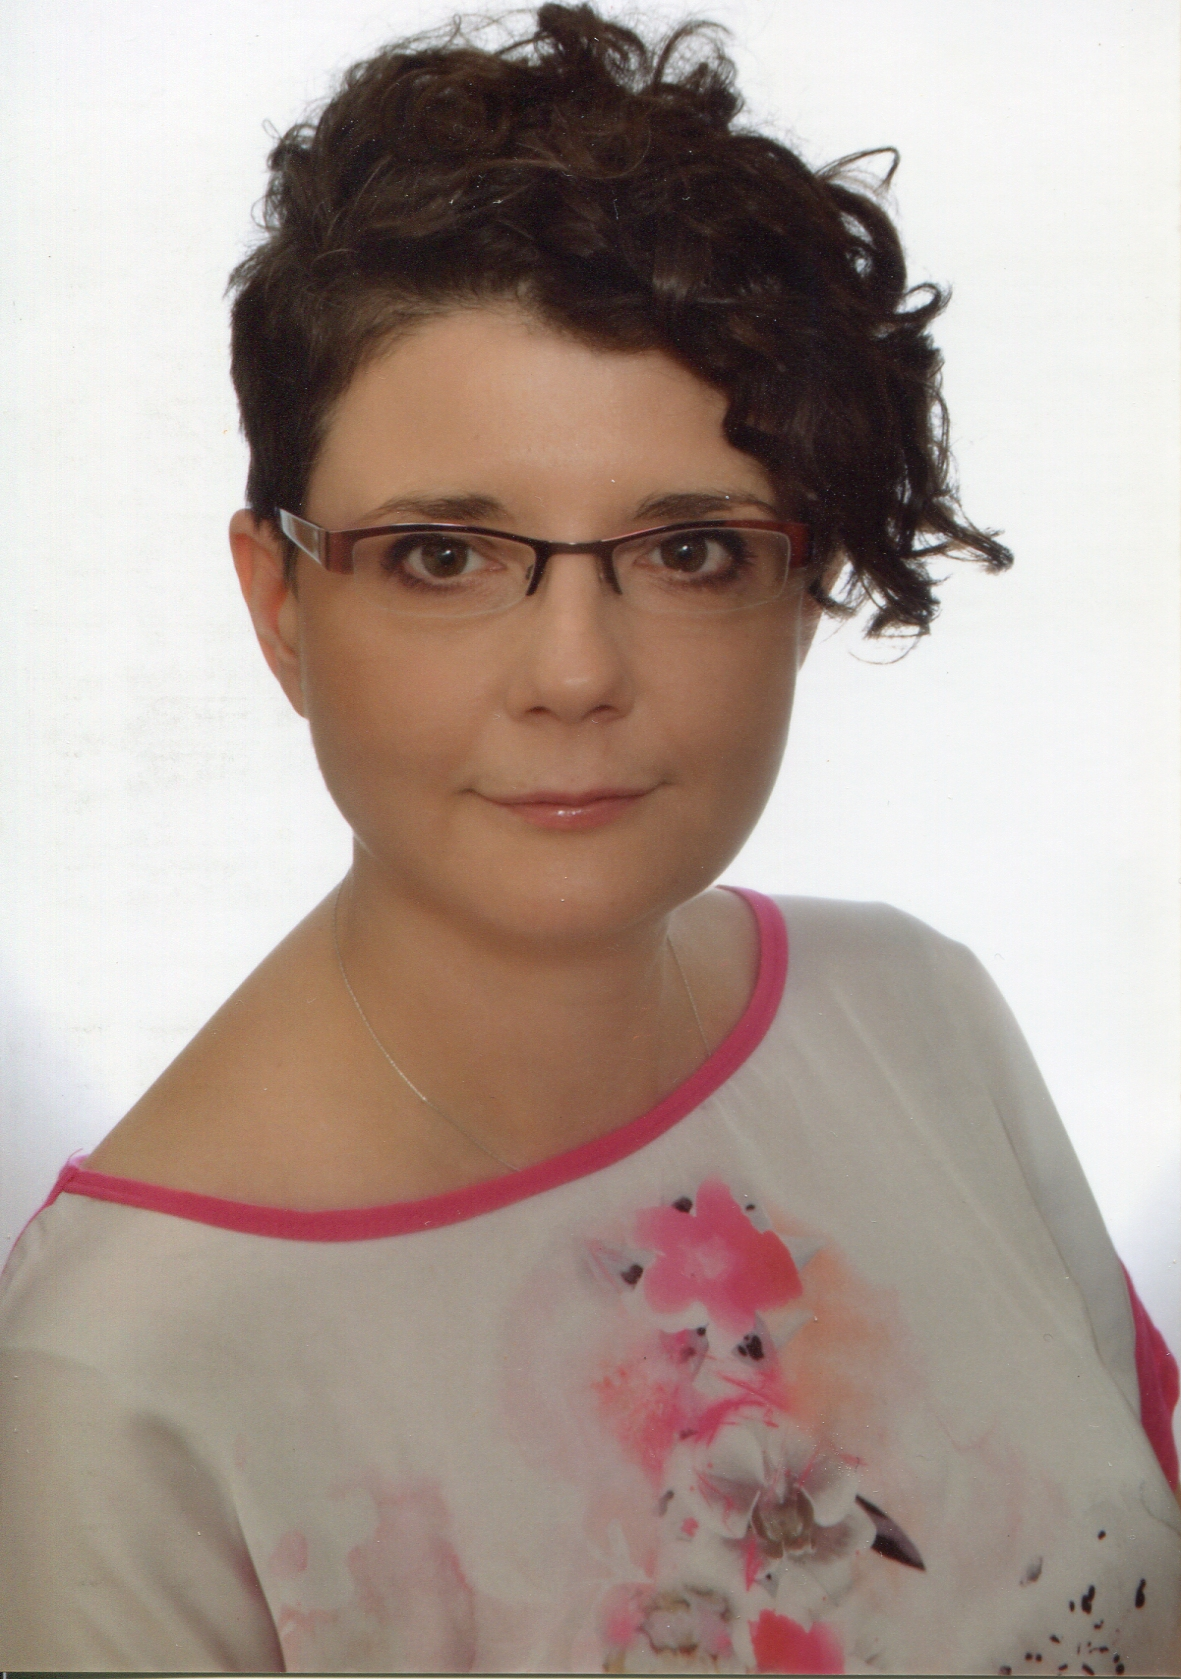 Dorota Ostrowska